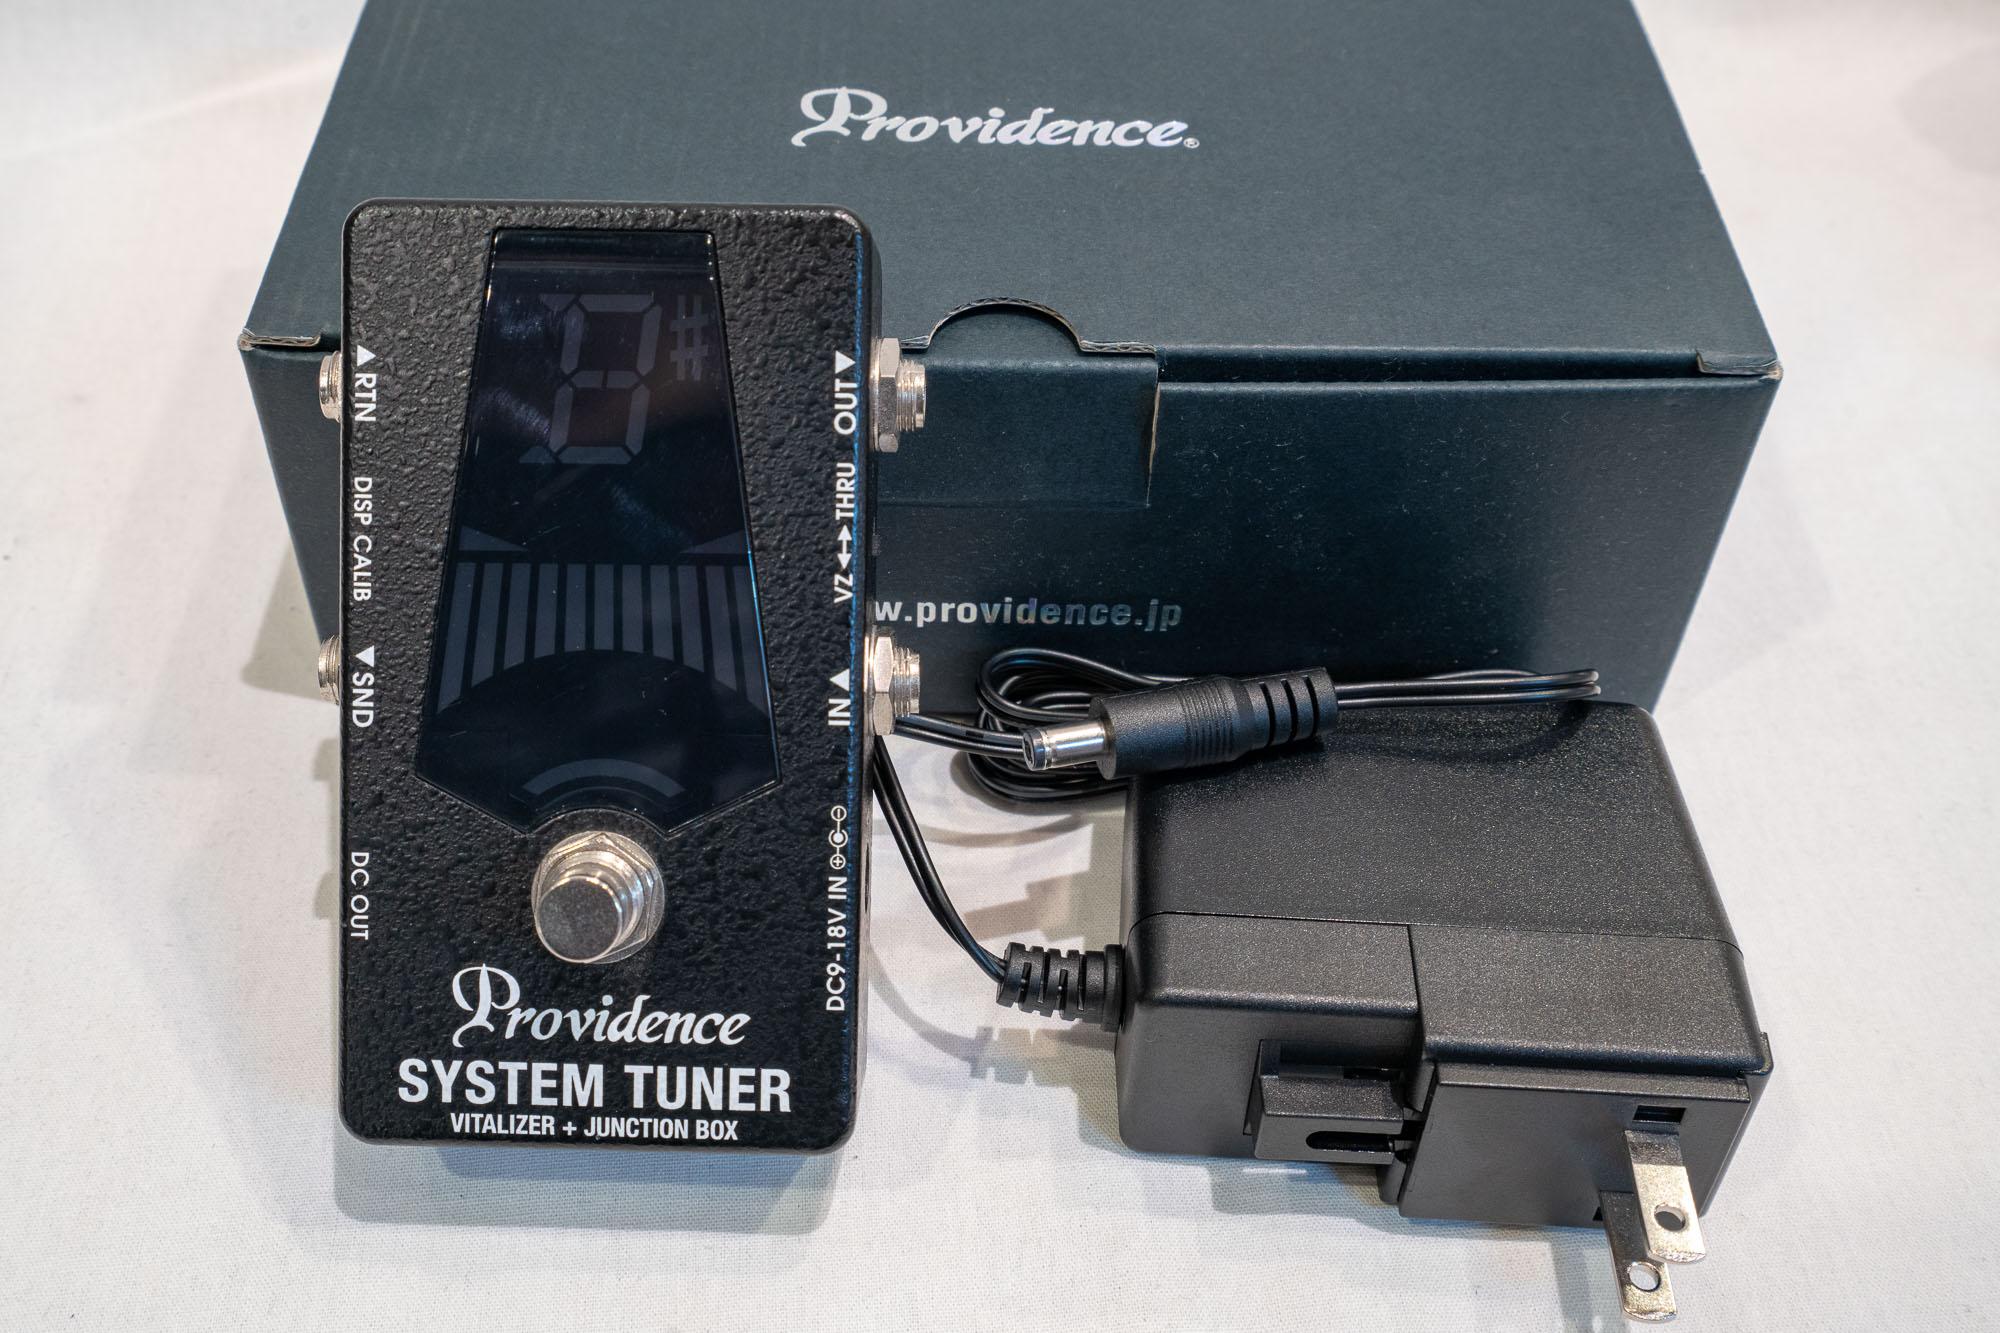 providence-system-tuner-stv-1jb